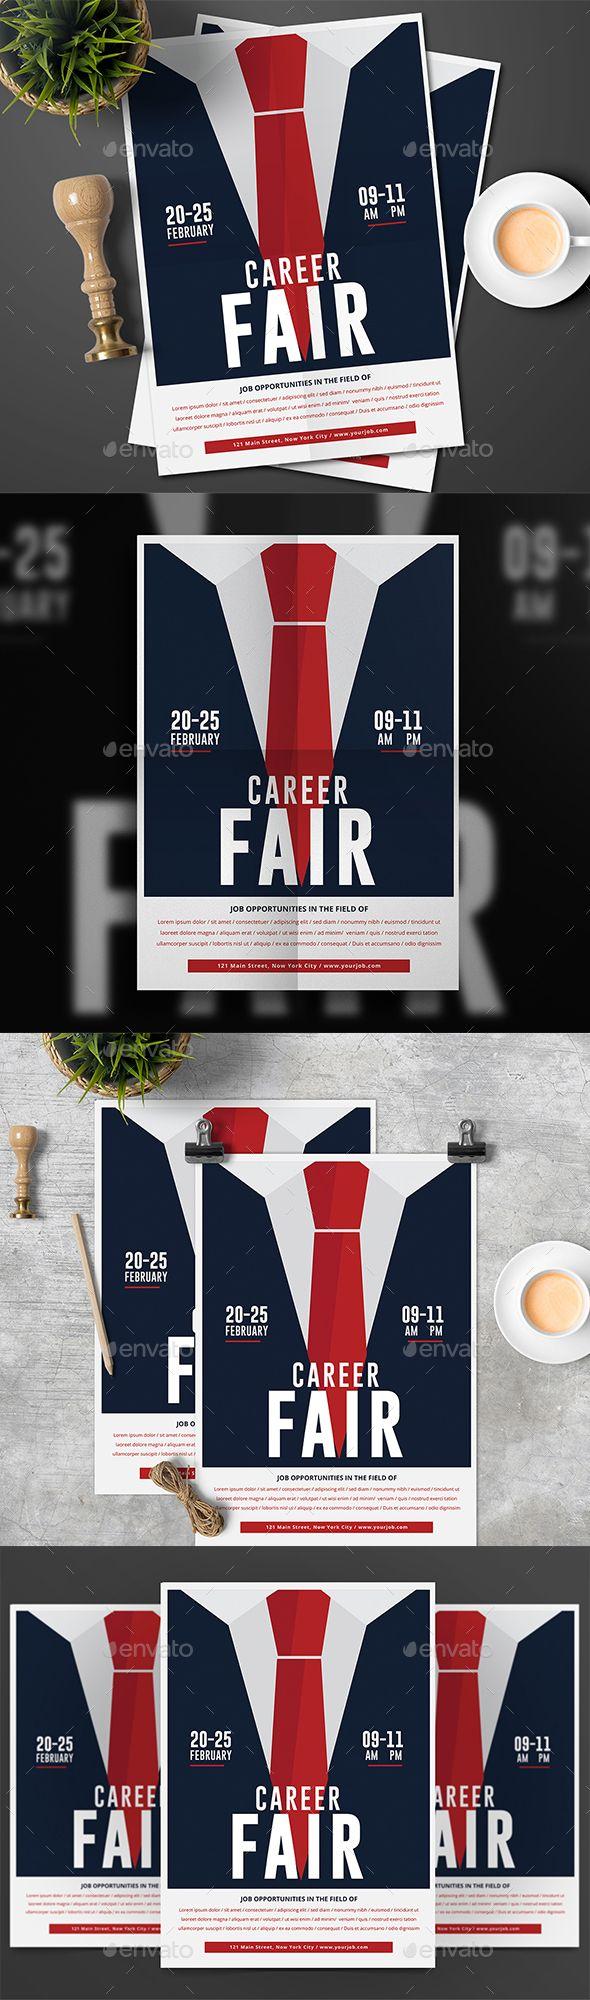 top ideas about job fair interview nails job career fair day flyer template psd ai illustrator